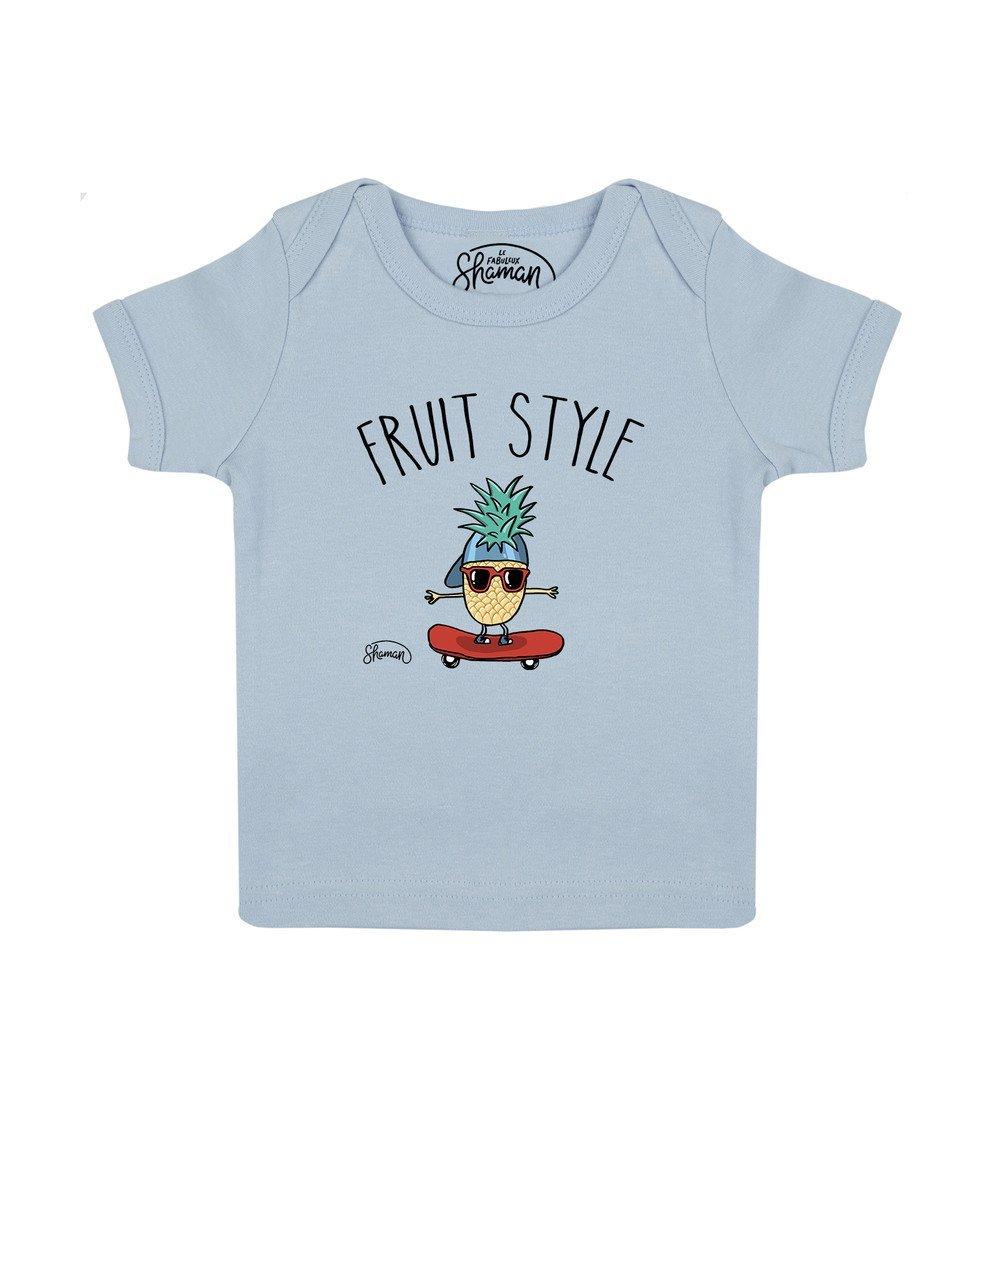 Tee shirt Fruit style